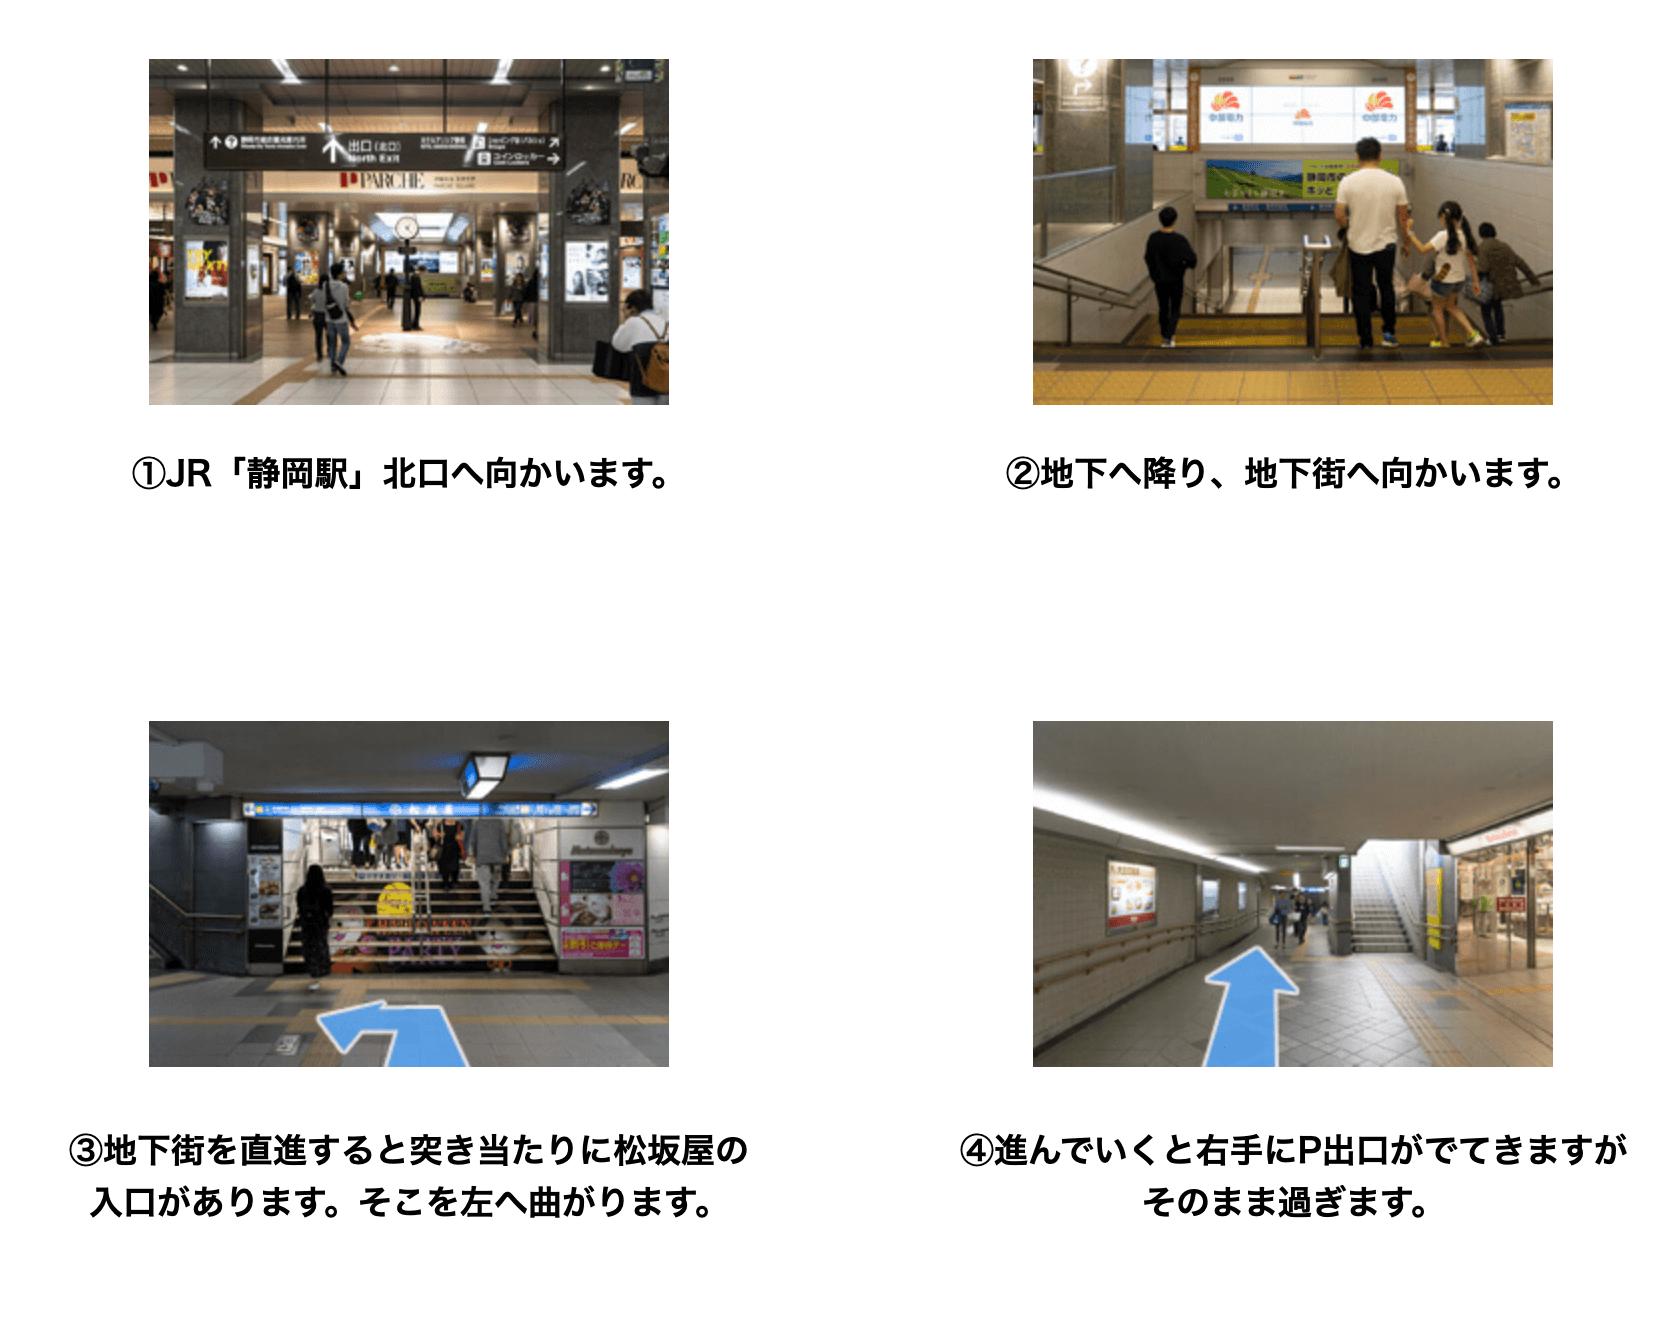 AGAスキンクリニック静岡院に迷わず辿り着くための完全MAP1(JR静岡駅からのアクセス)